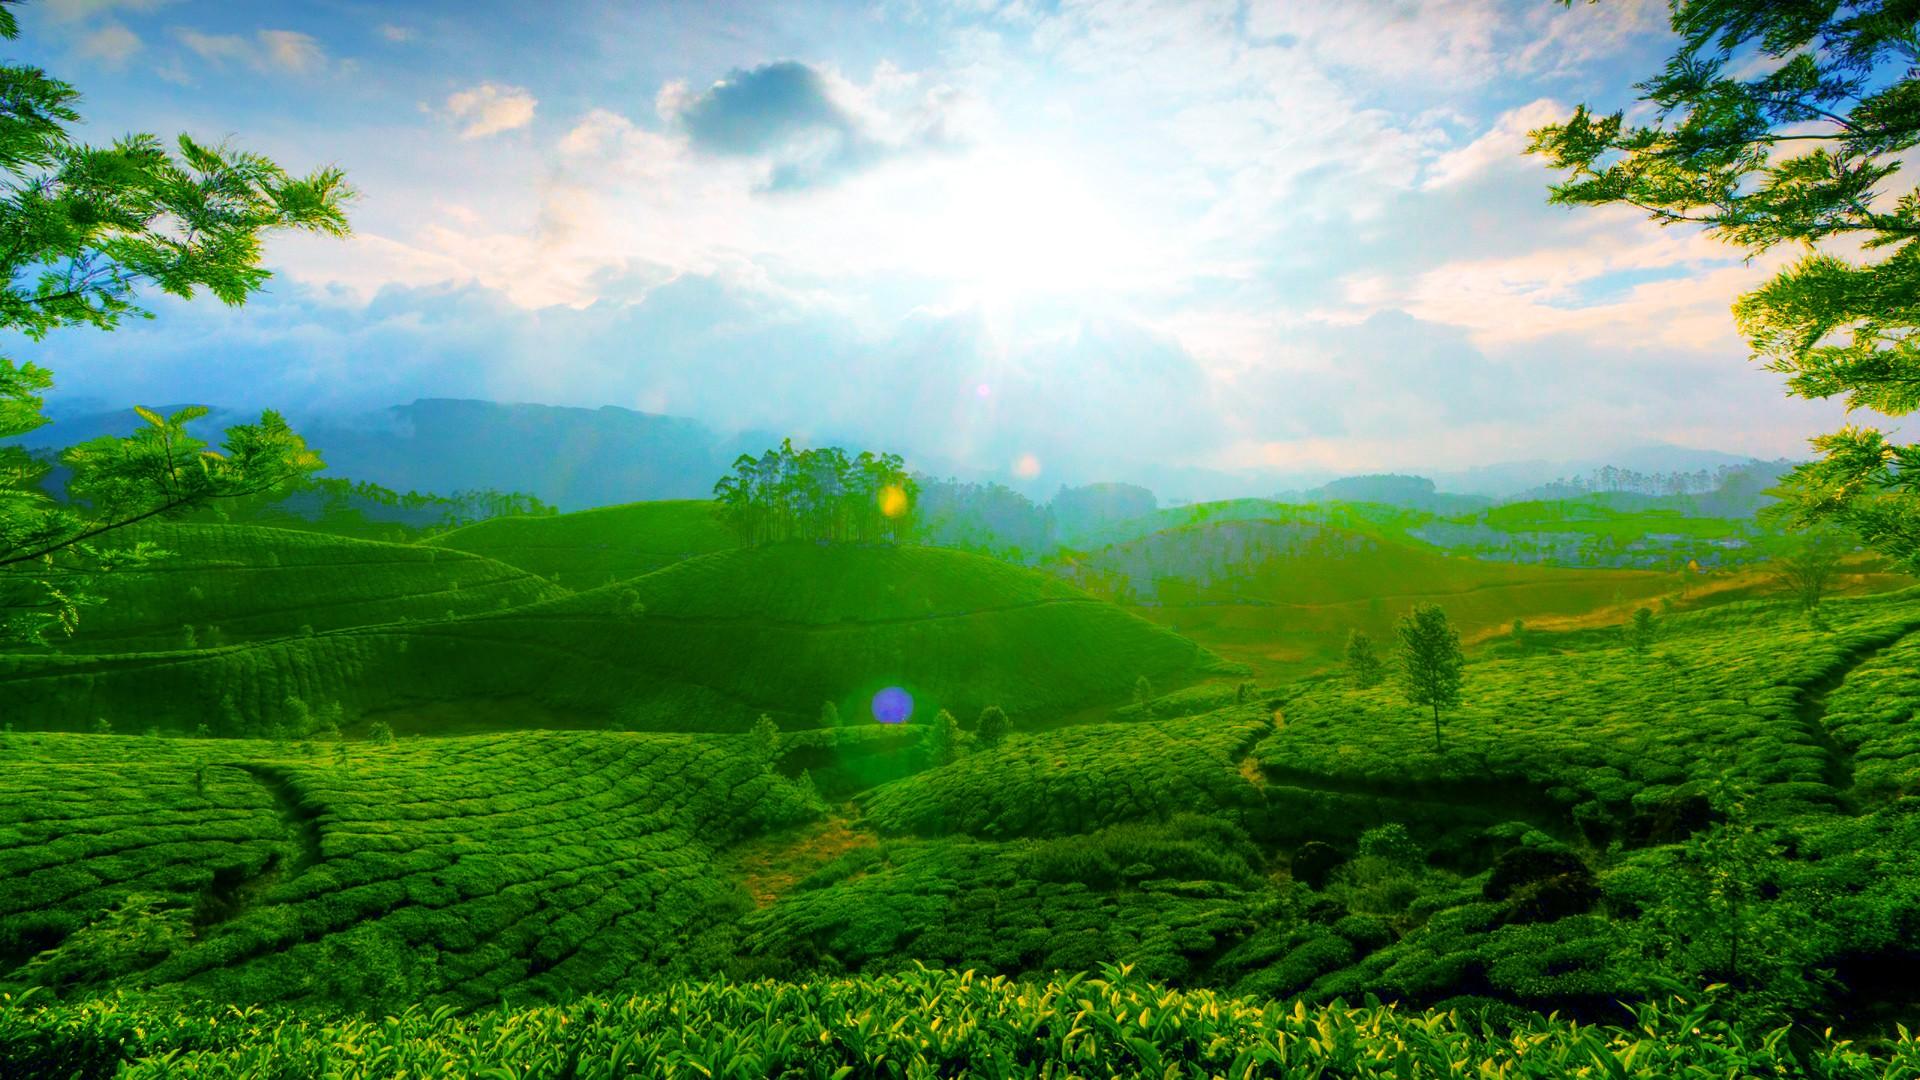 Beautiful Green Landscape Wallpaper 1920x1080